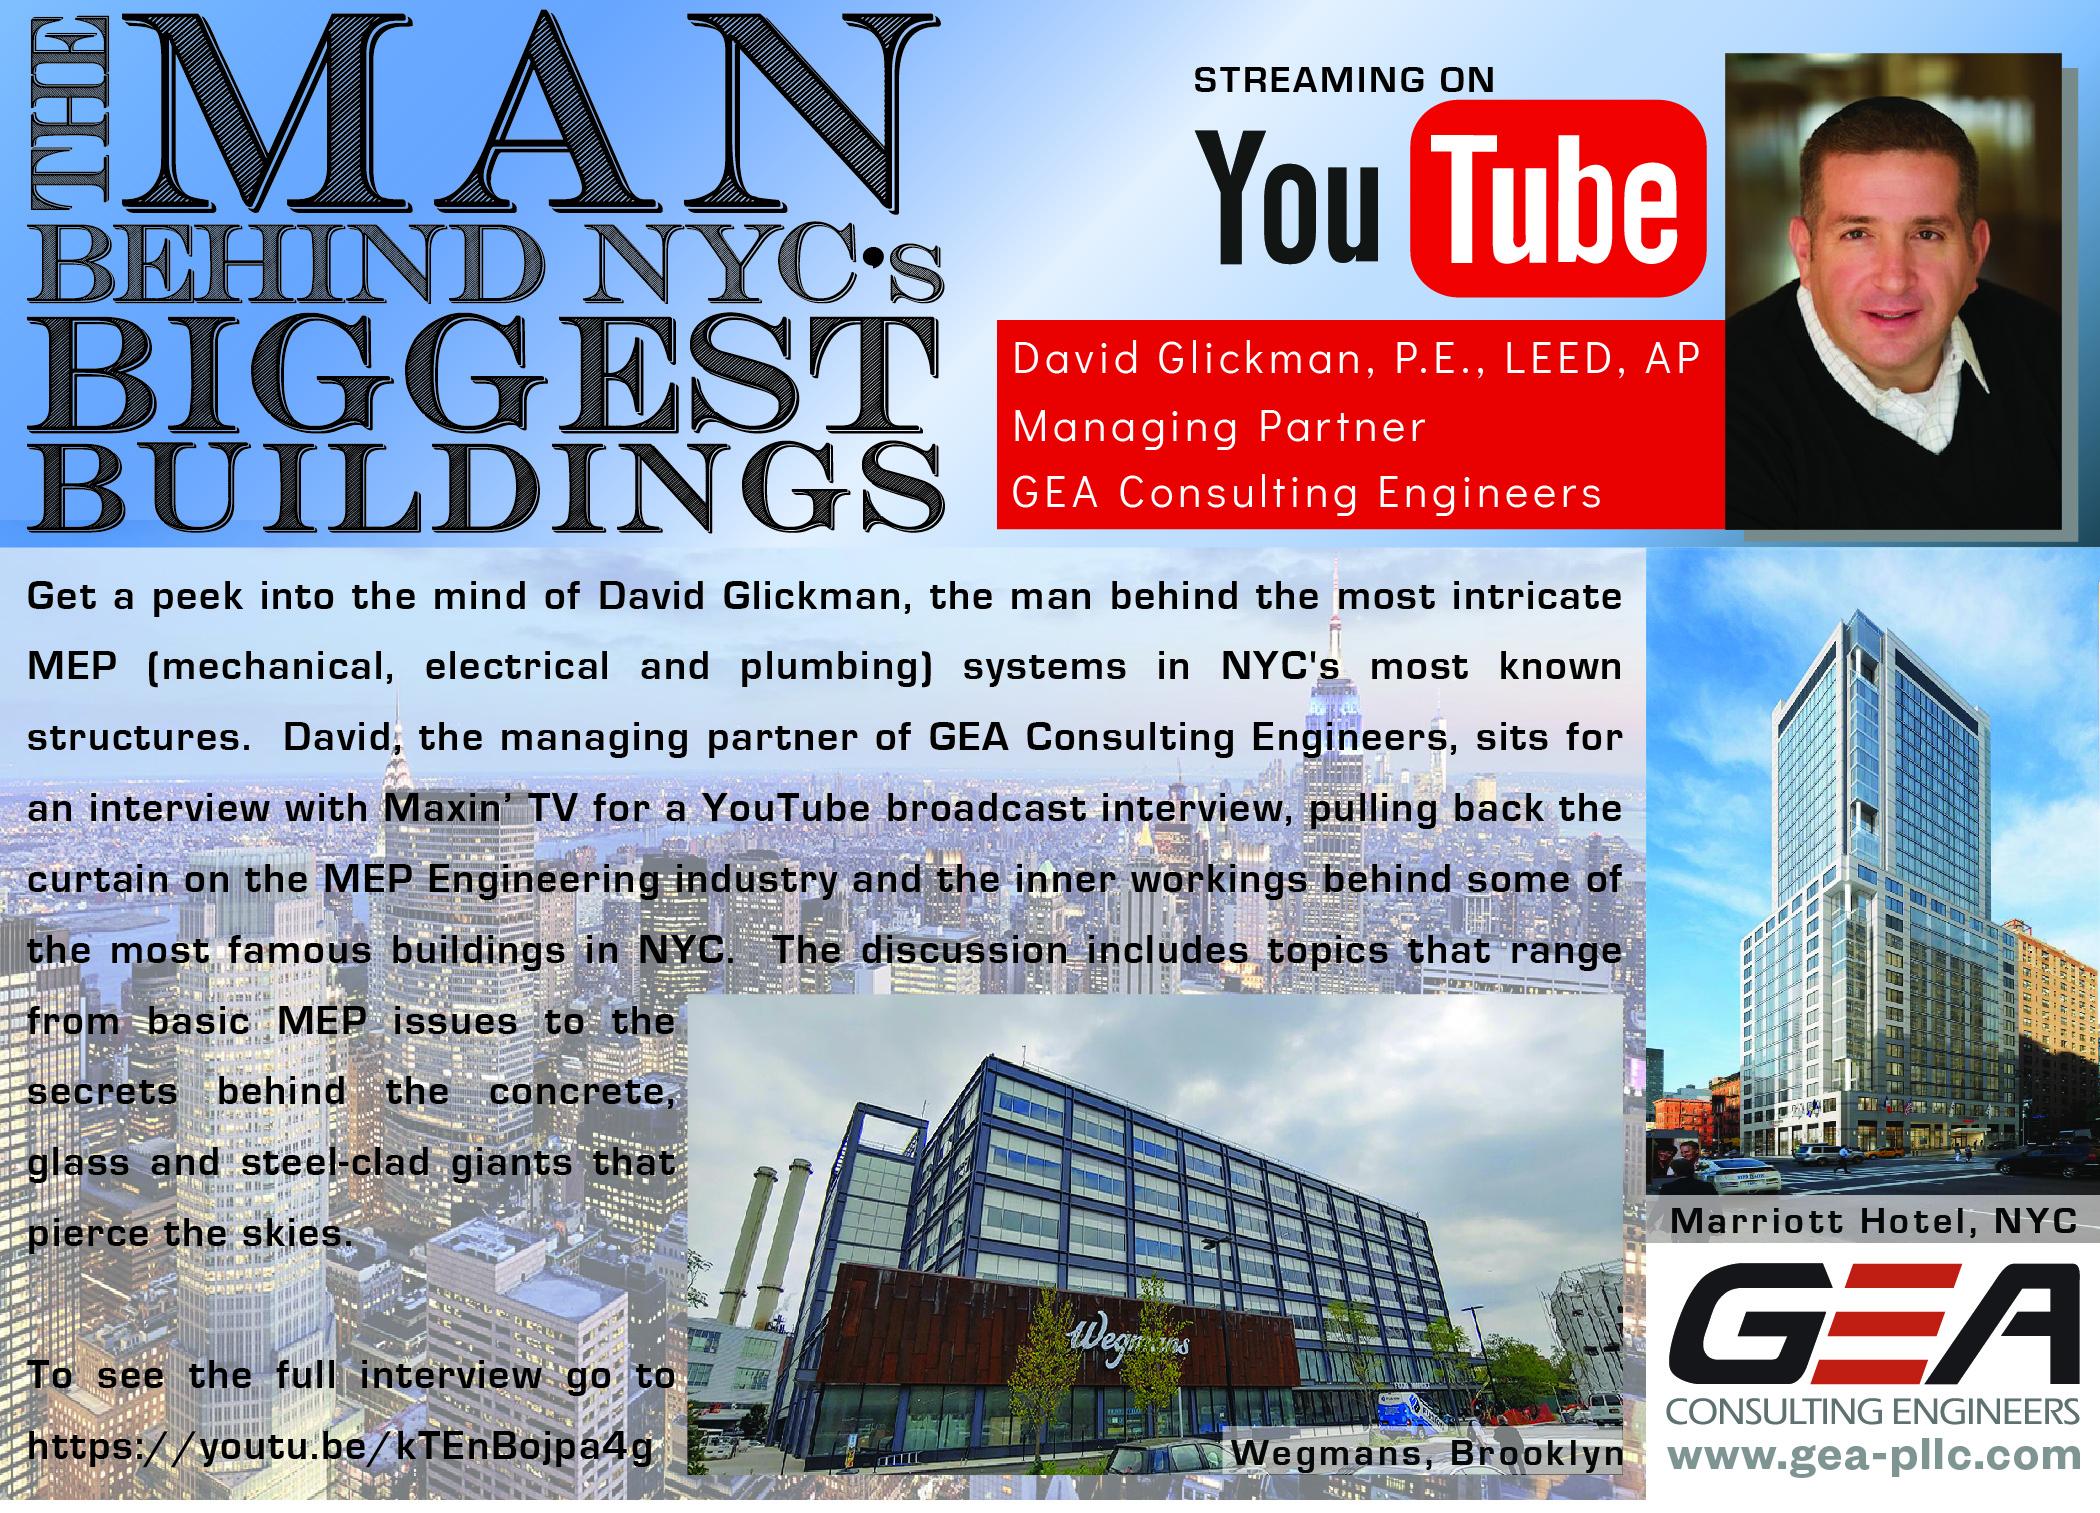 The Man Behind NYC's Biggest Buildings